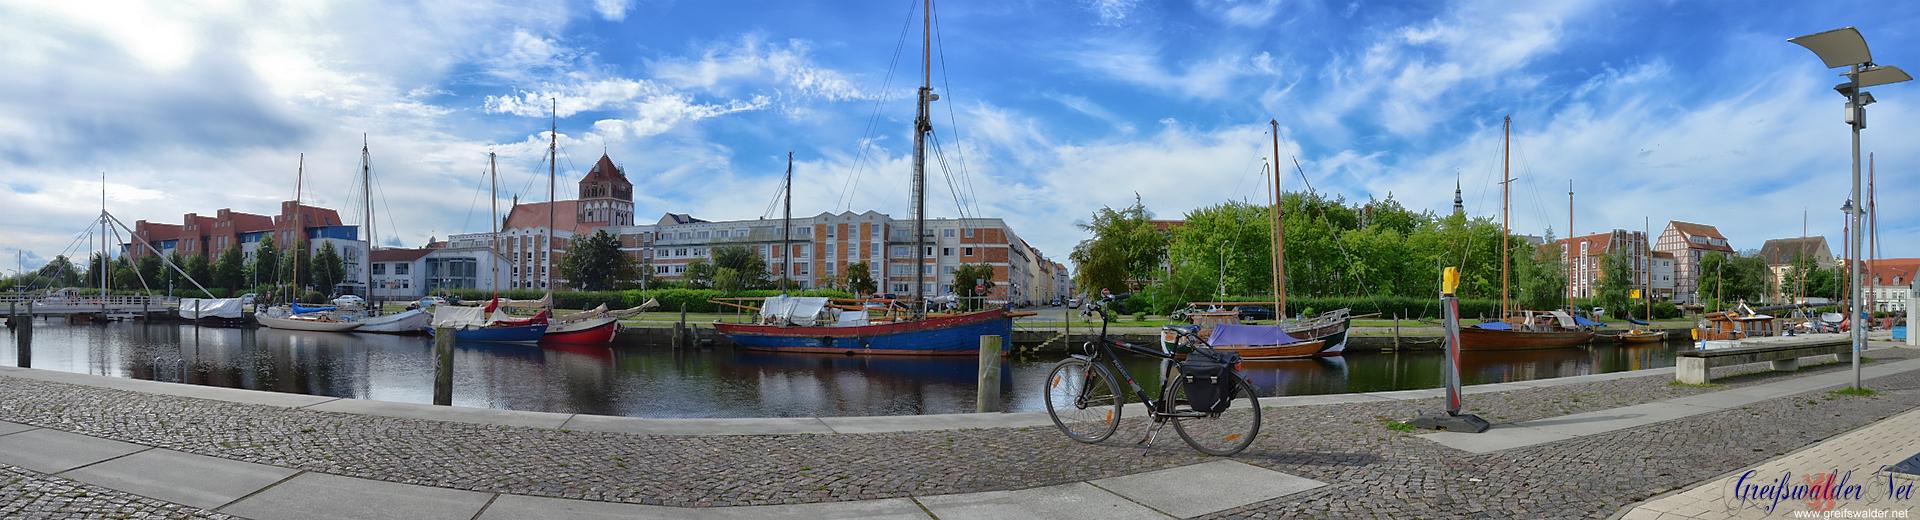 Pause am Museumshafen in Greifswald